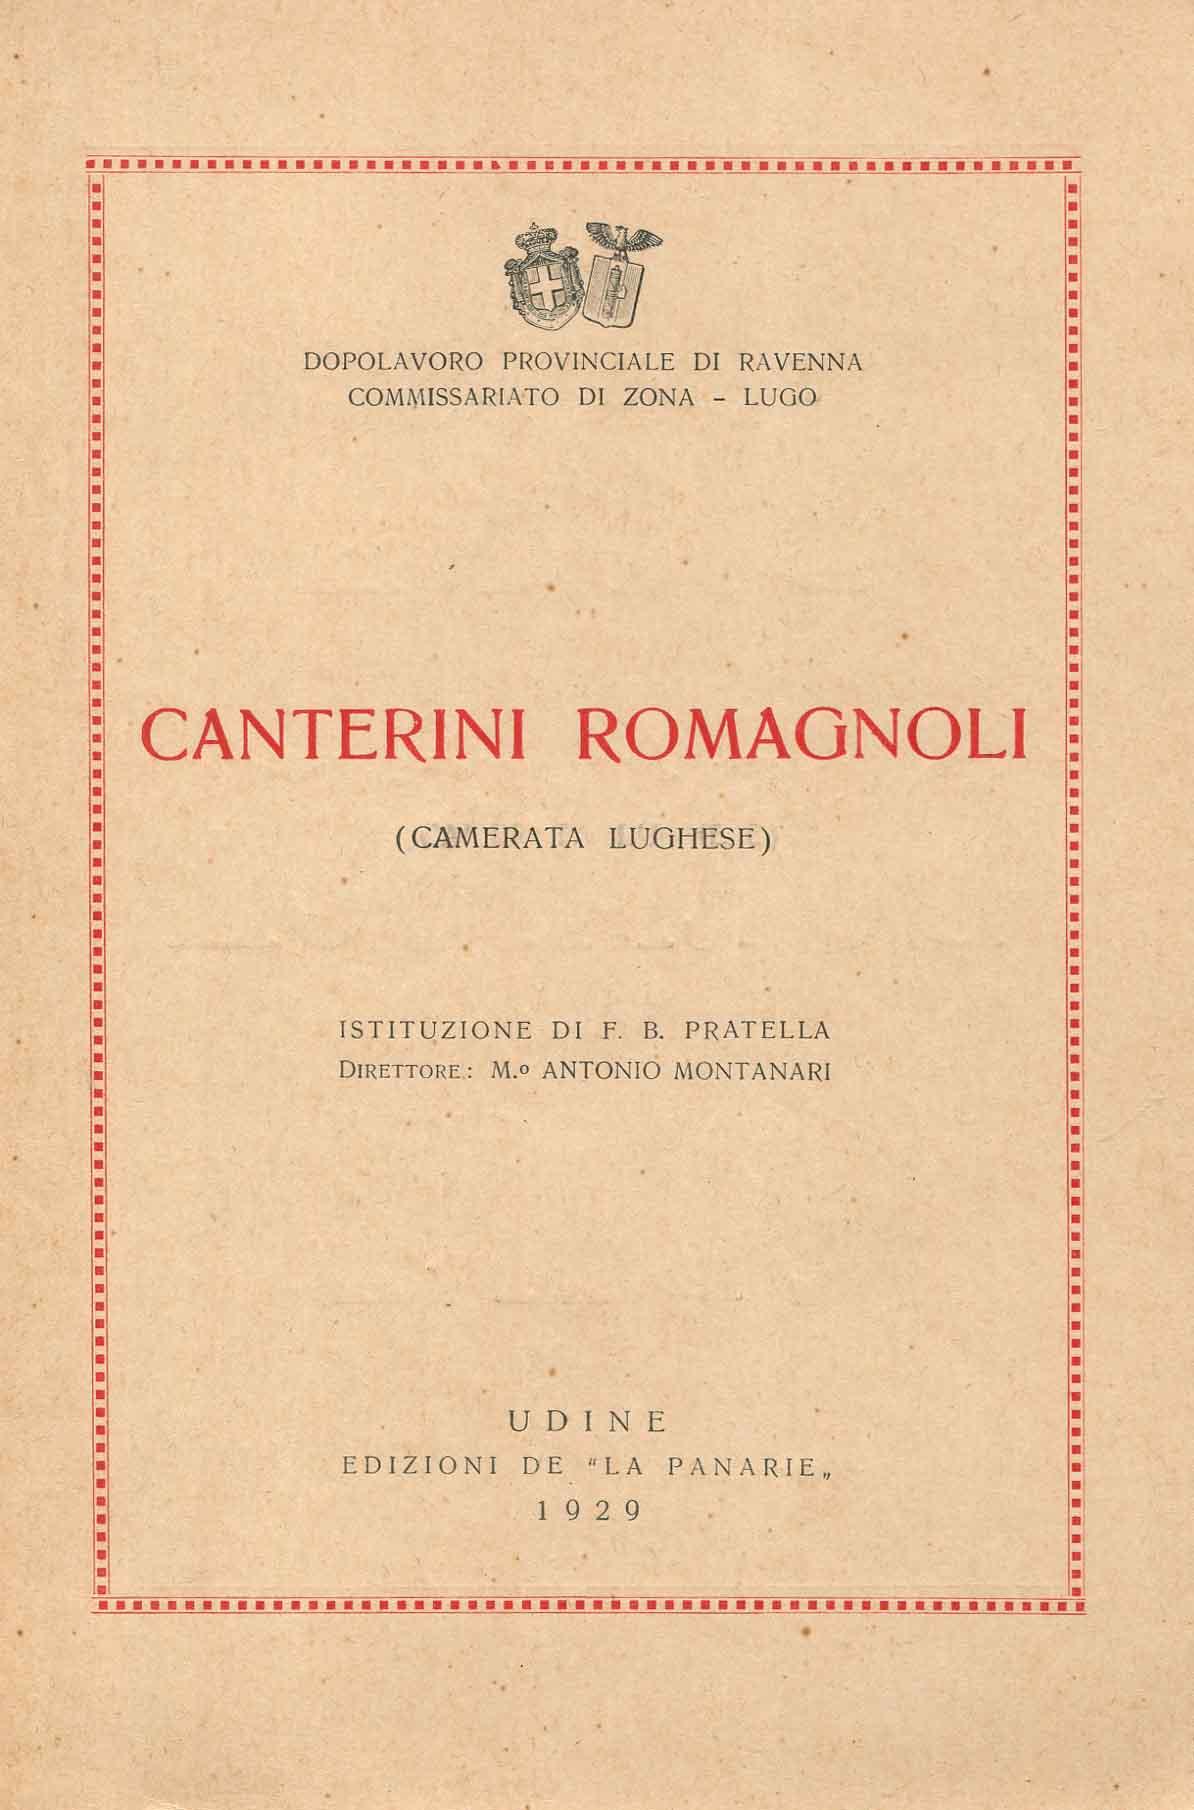 Canterini romagnoli : (camerata lughese)